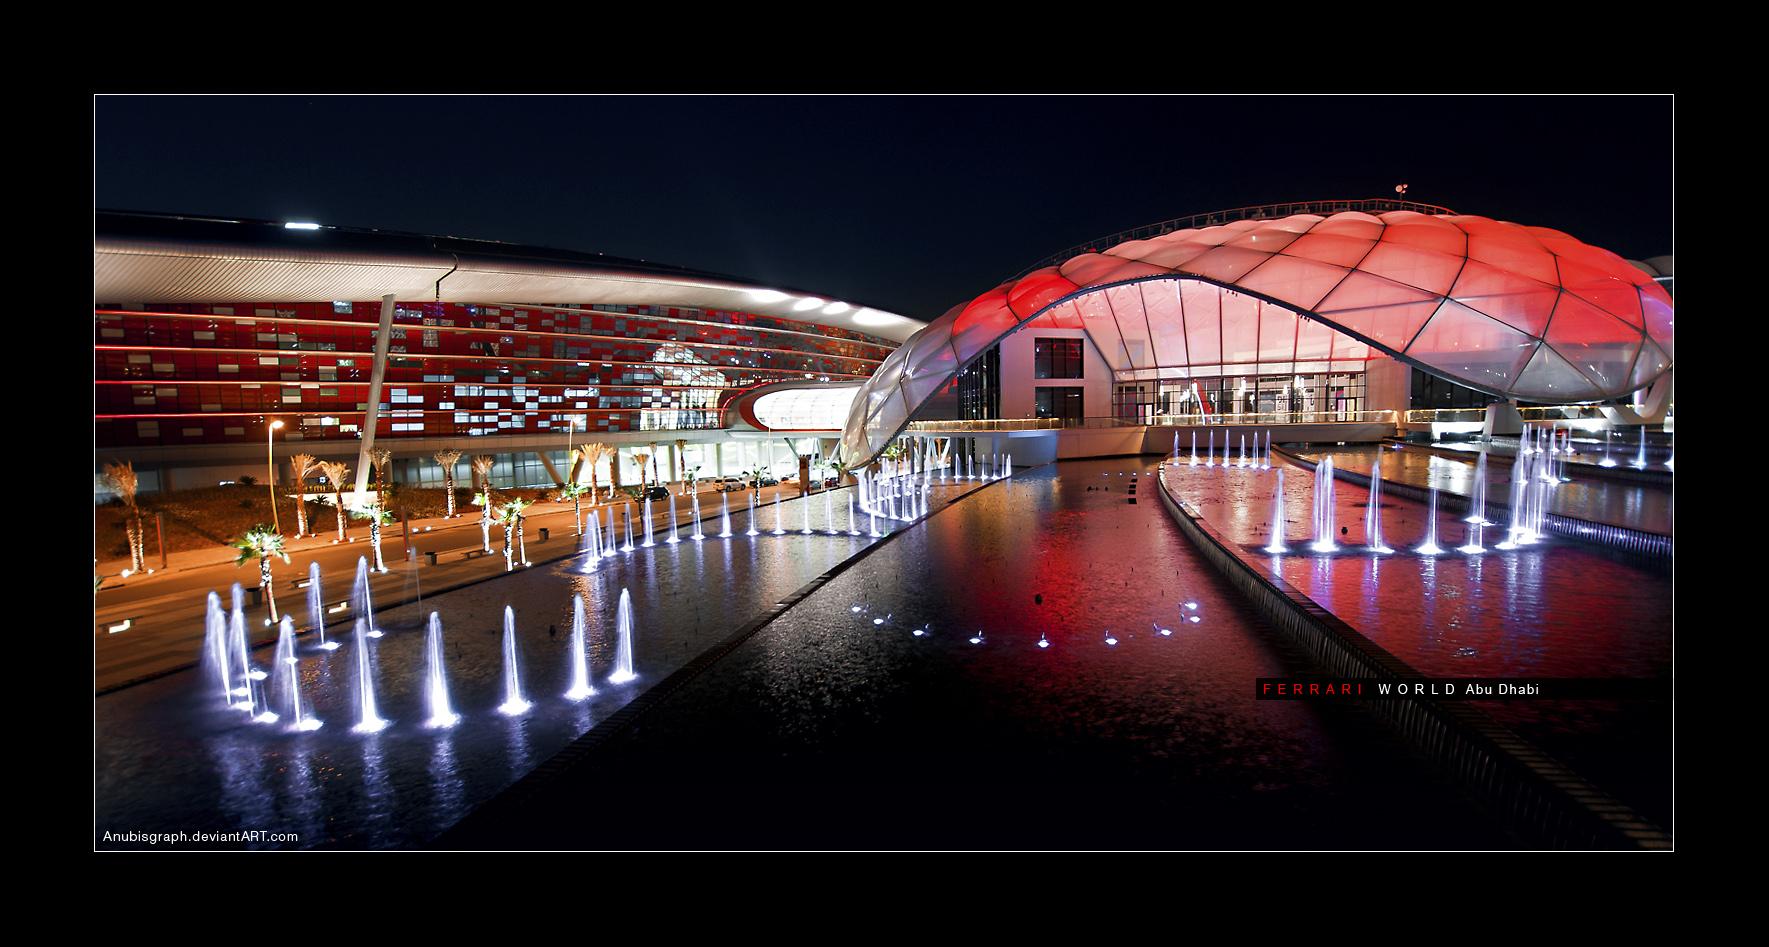 Ferrari World Abu Dhabi 4 by AnubisGraph on DeviantArt